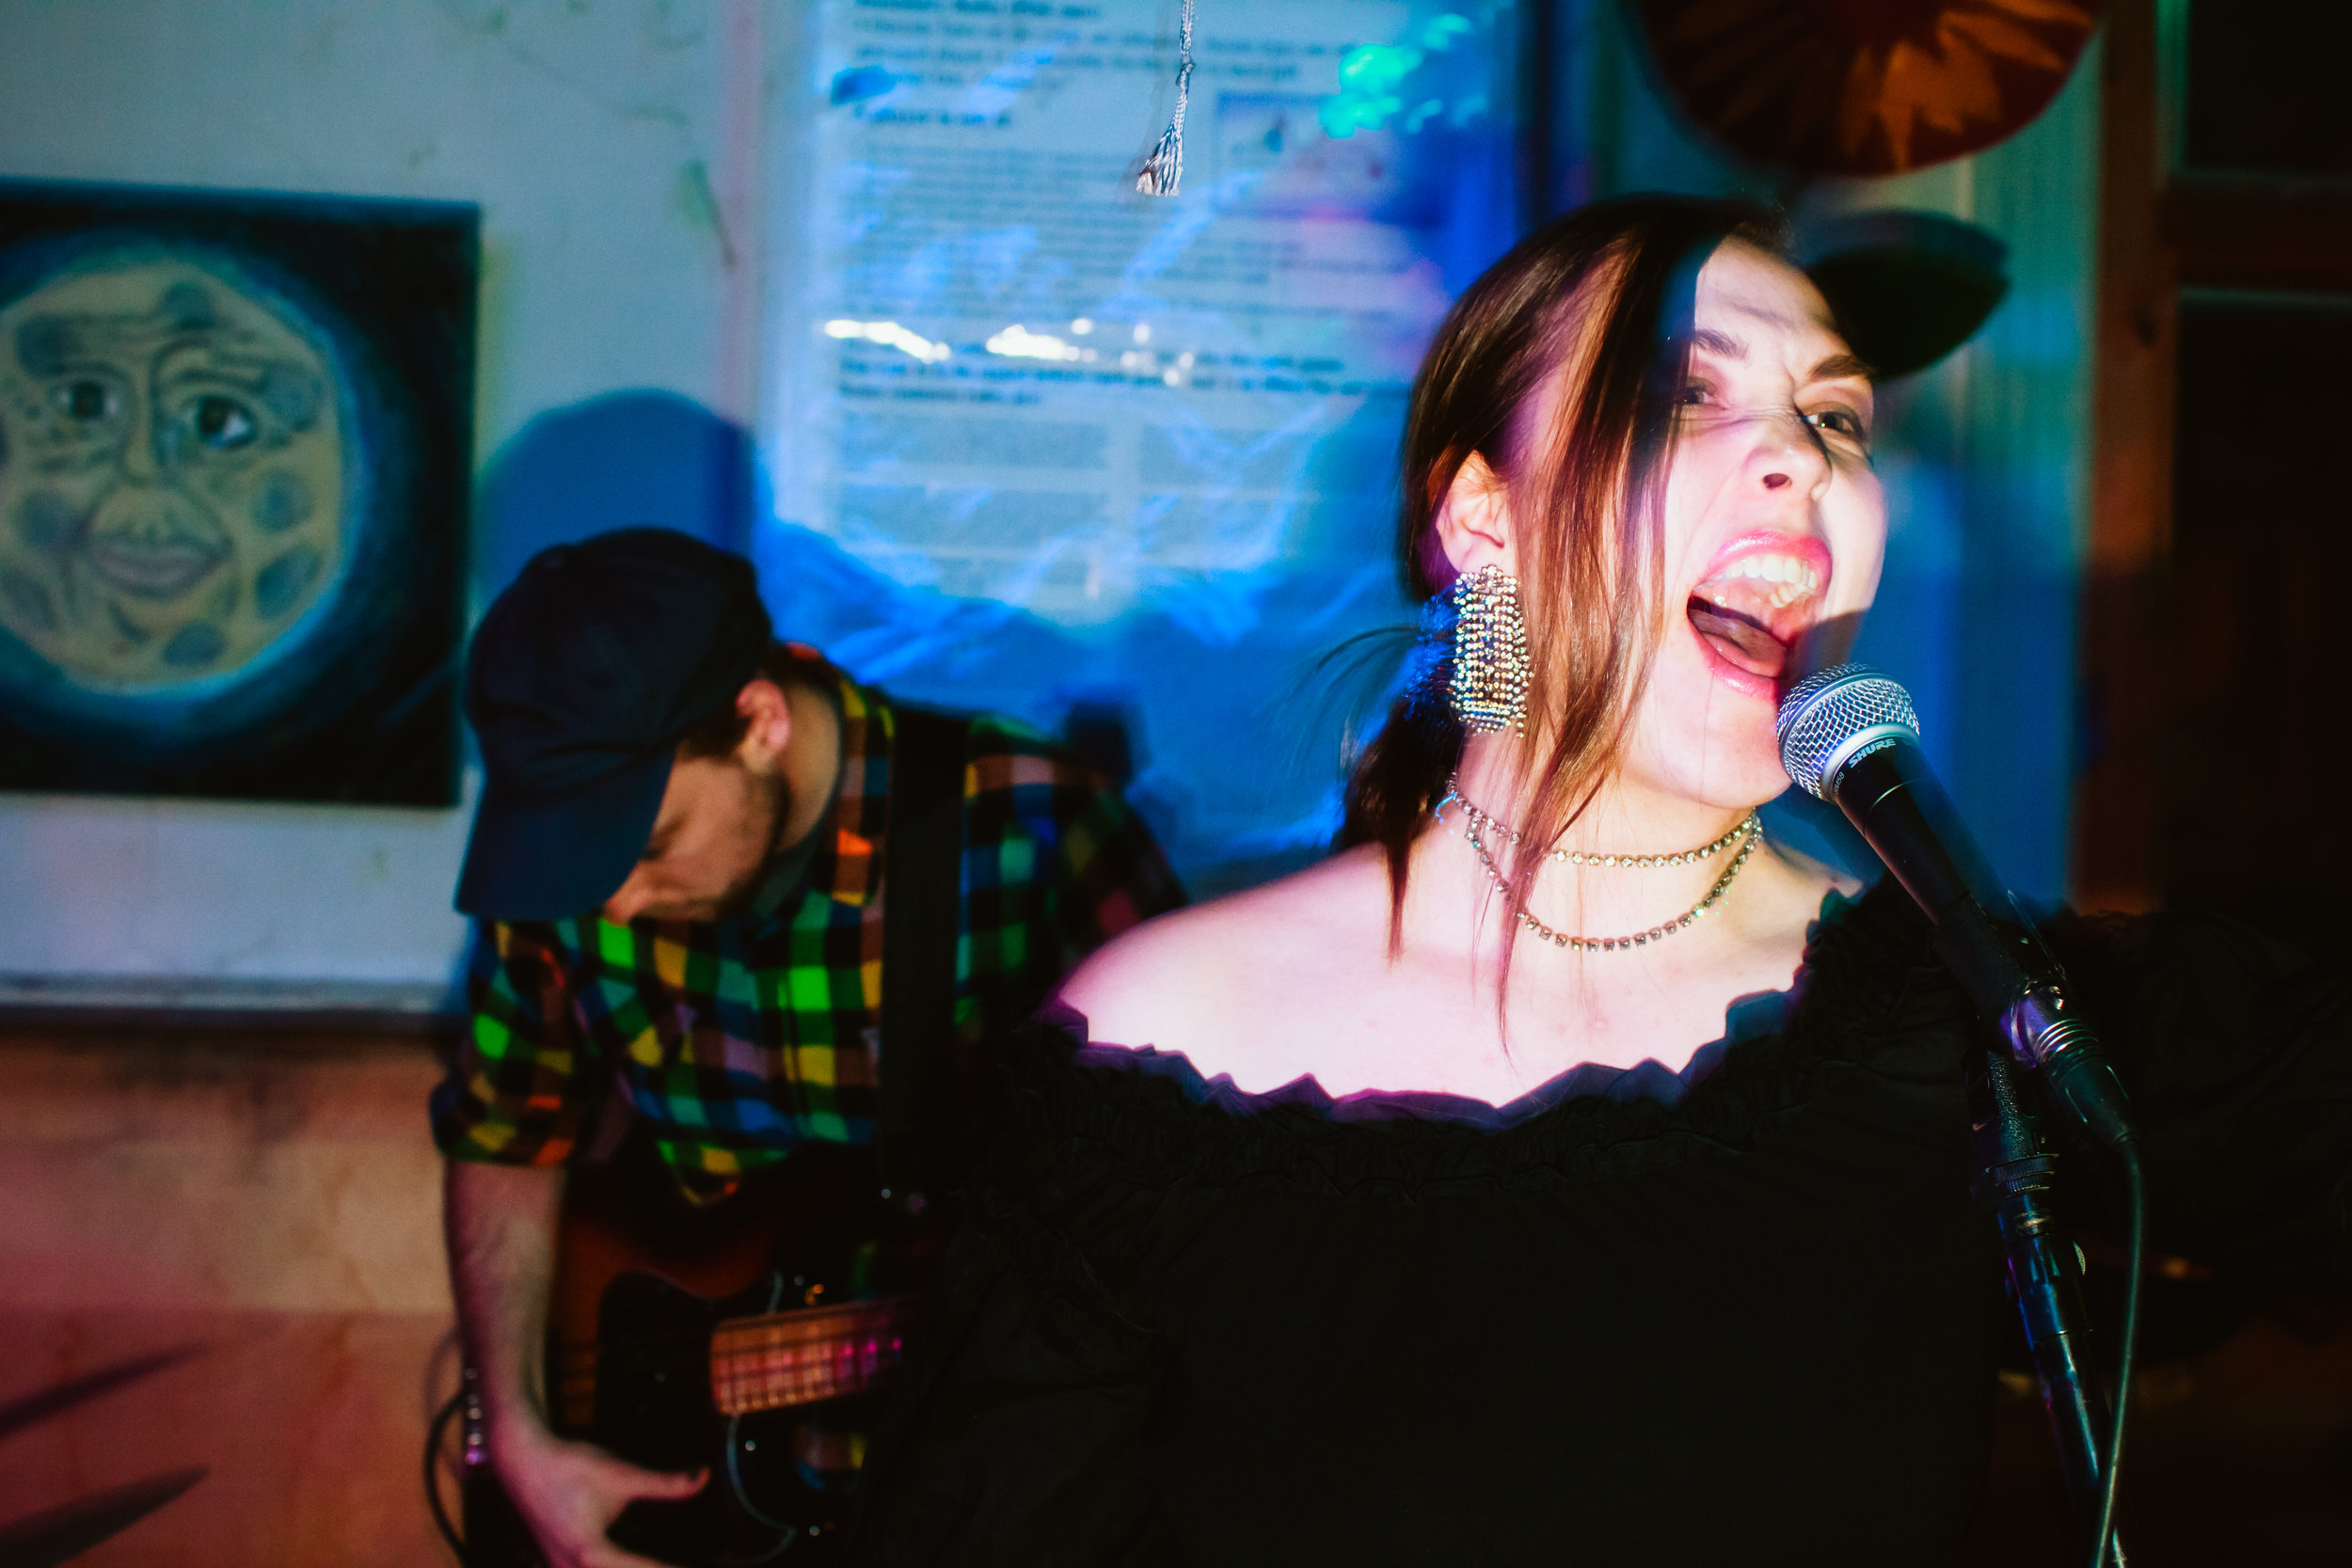 saajtak live at Arbor Vitae, Ann Arbor, March 2016.